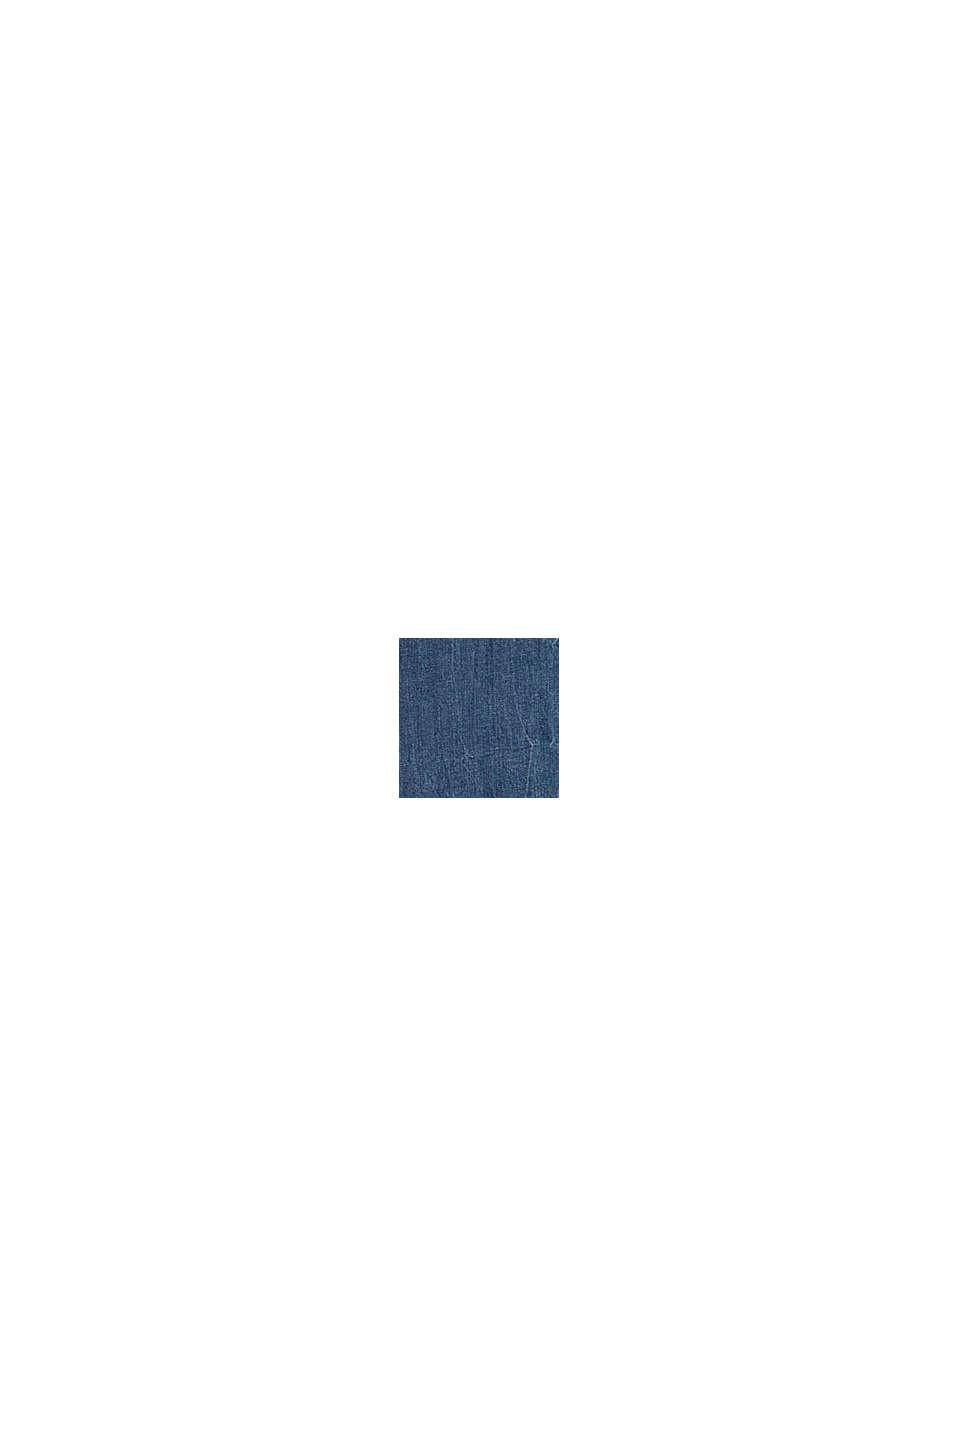 Jeans stretch CURVY in cotone biologico, BLUE MEDIUM WASHED, swatch